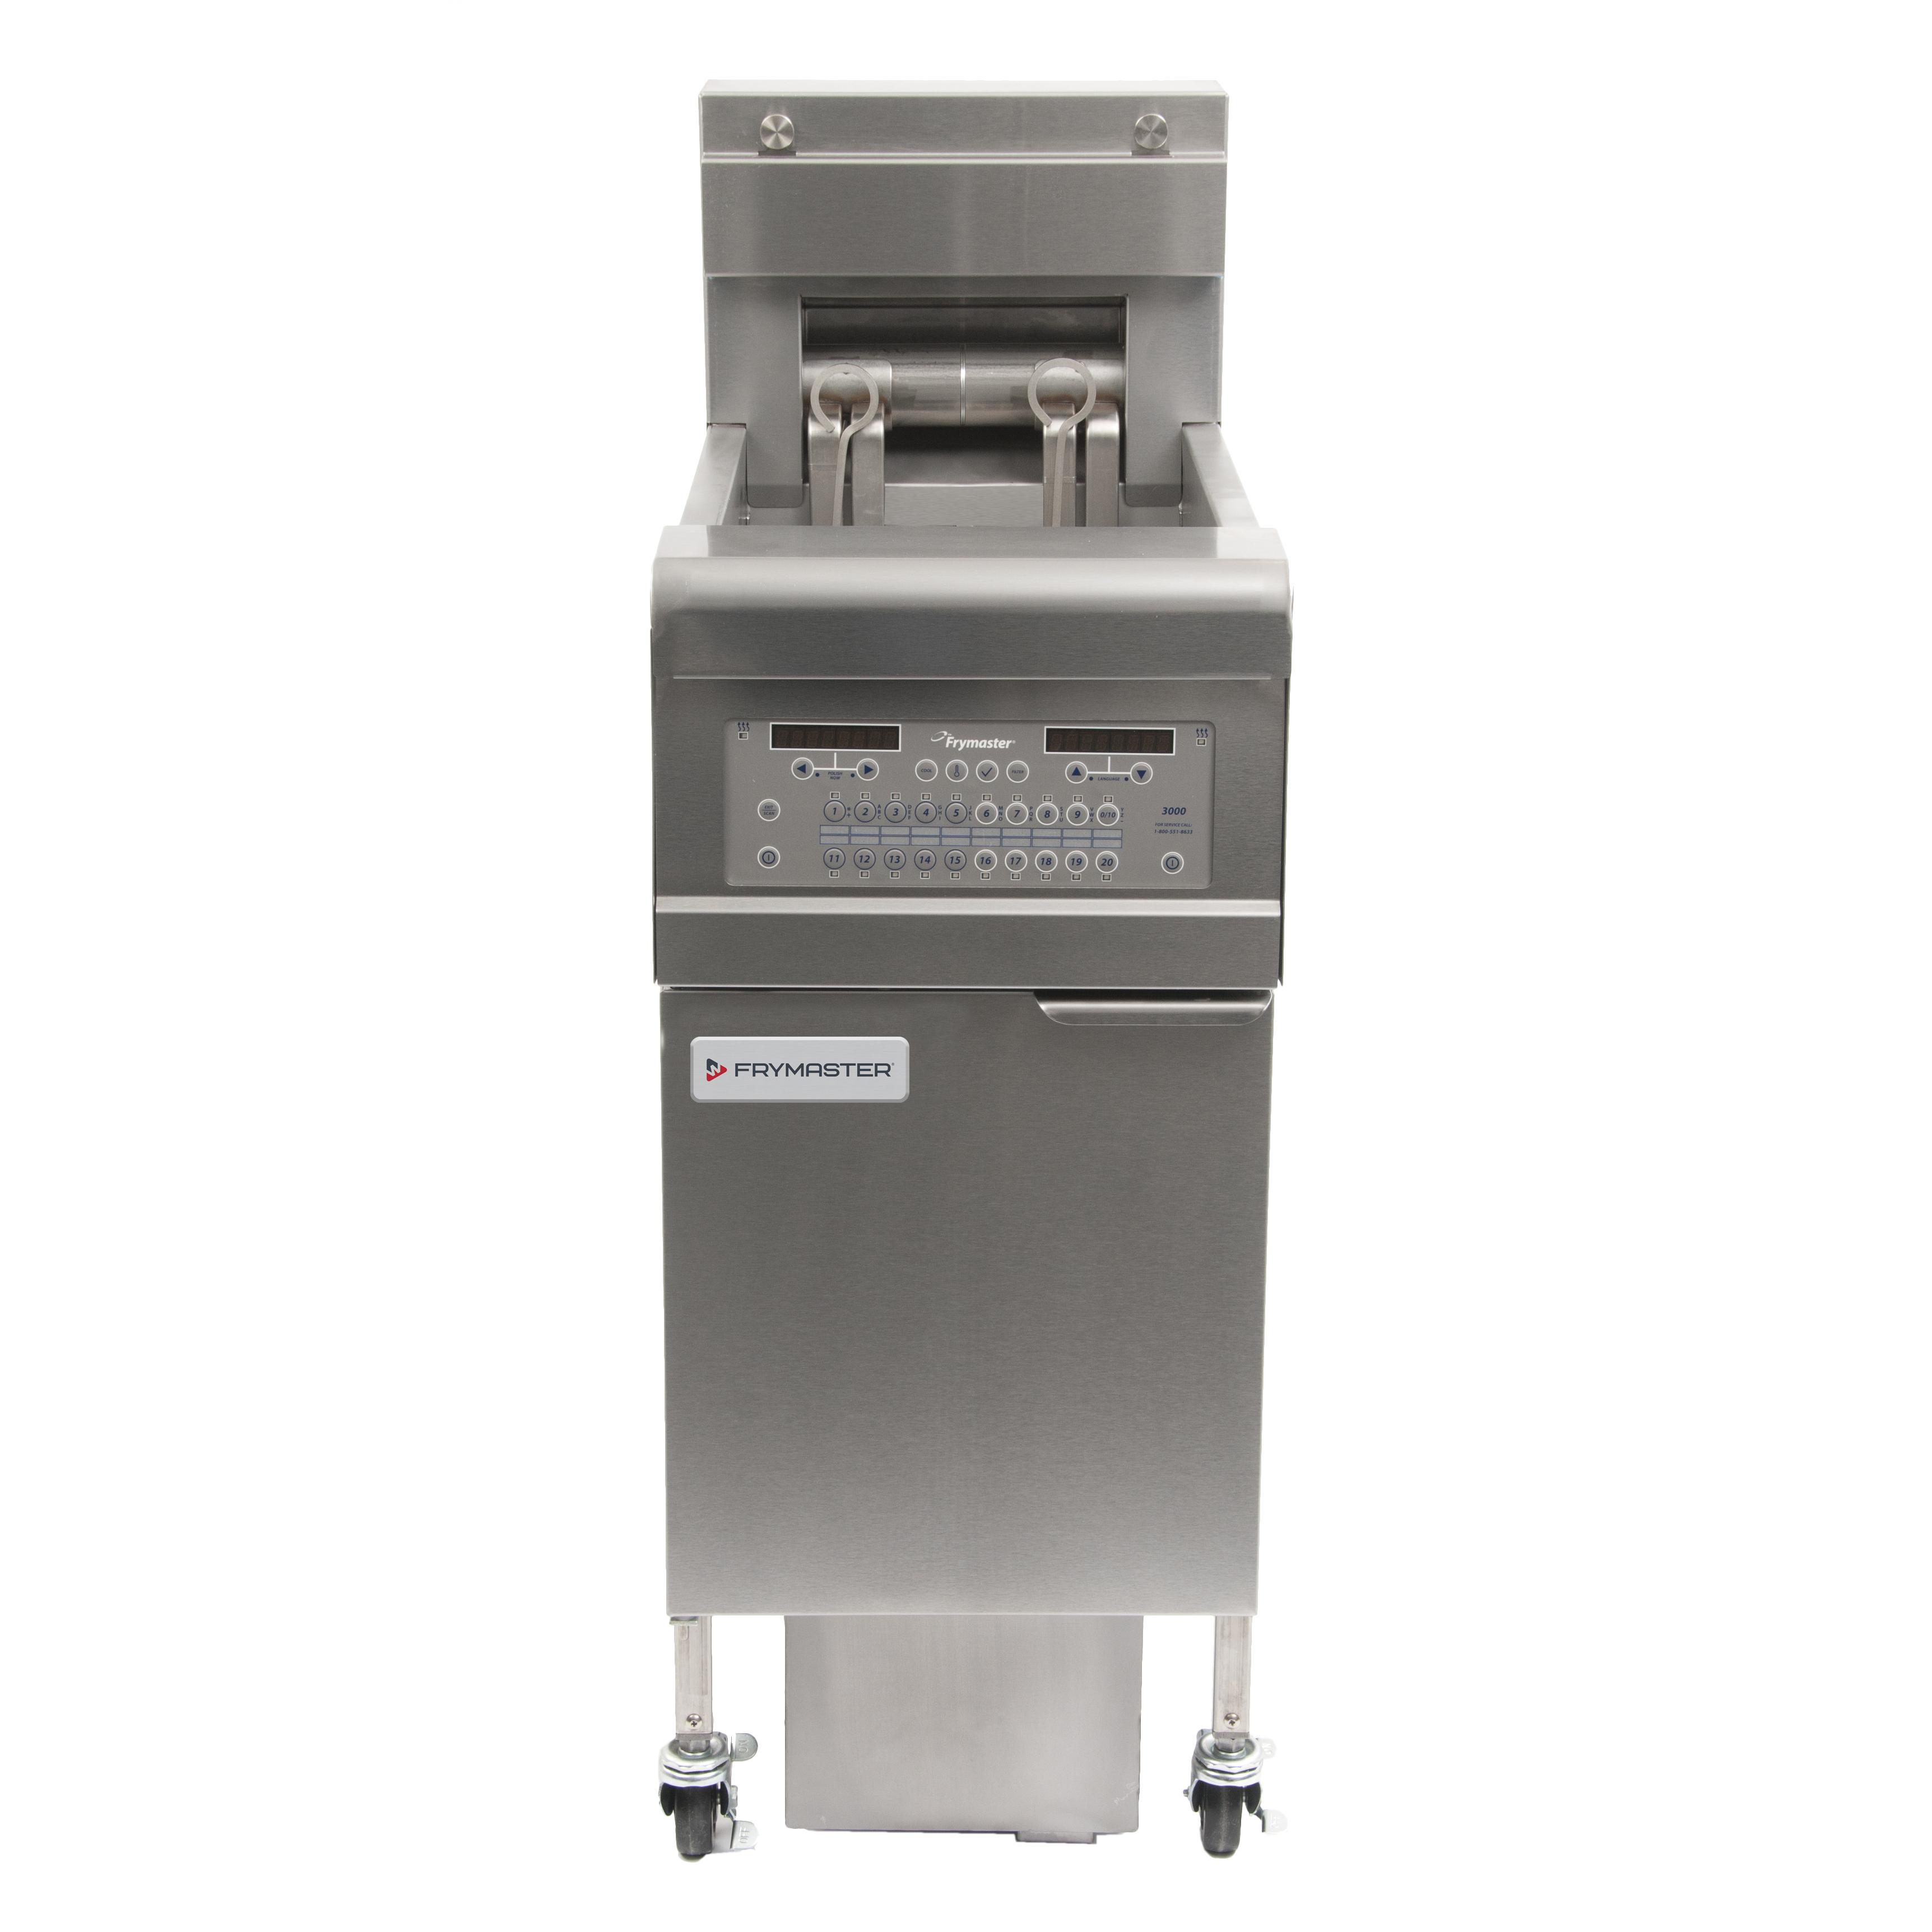 Frymaster FPEL114C fryer, electric, floor model, full pot